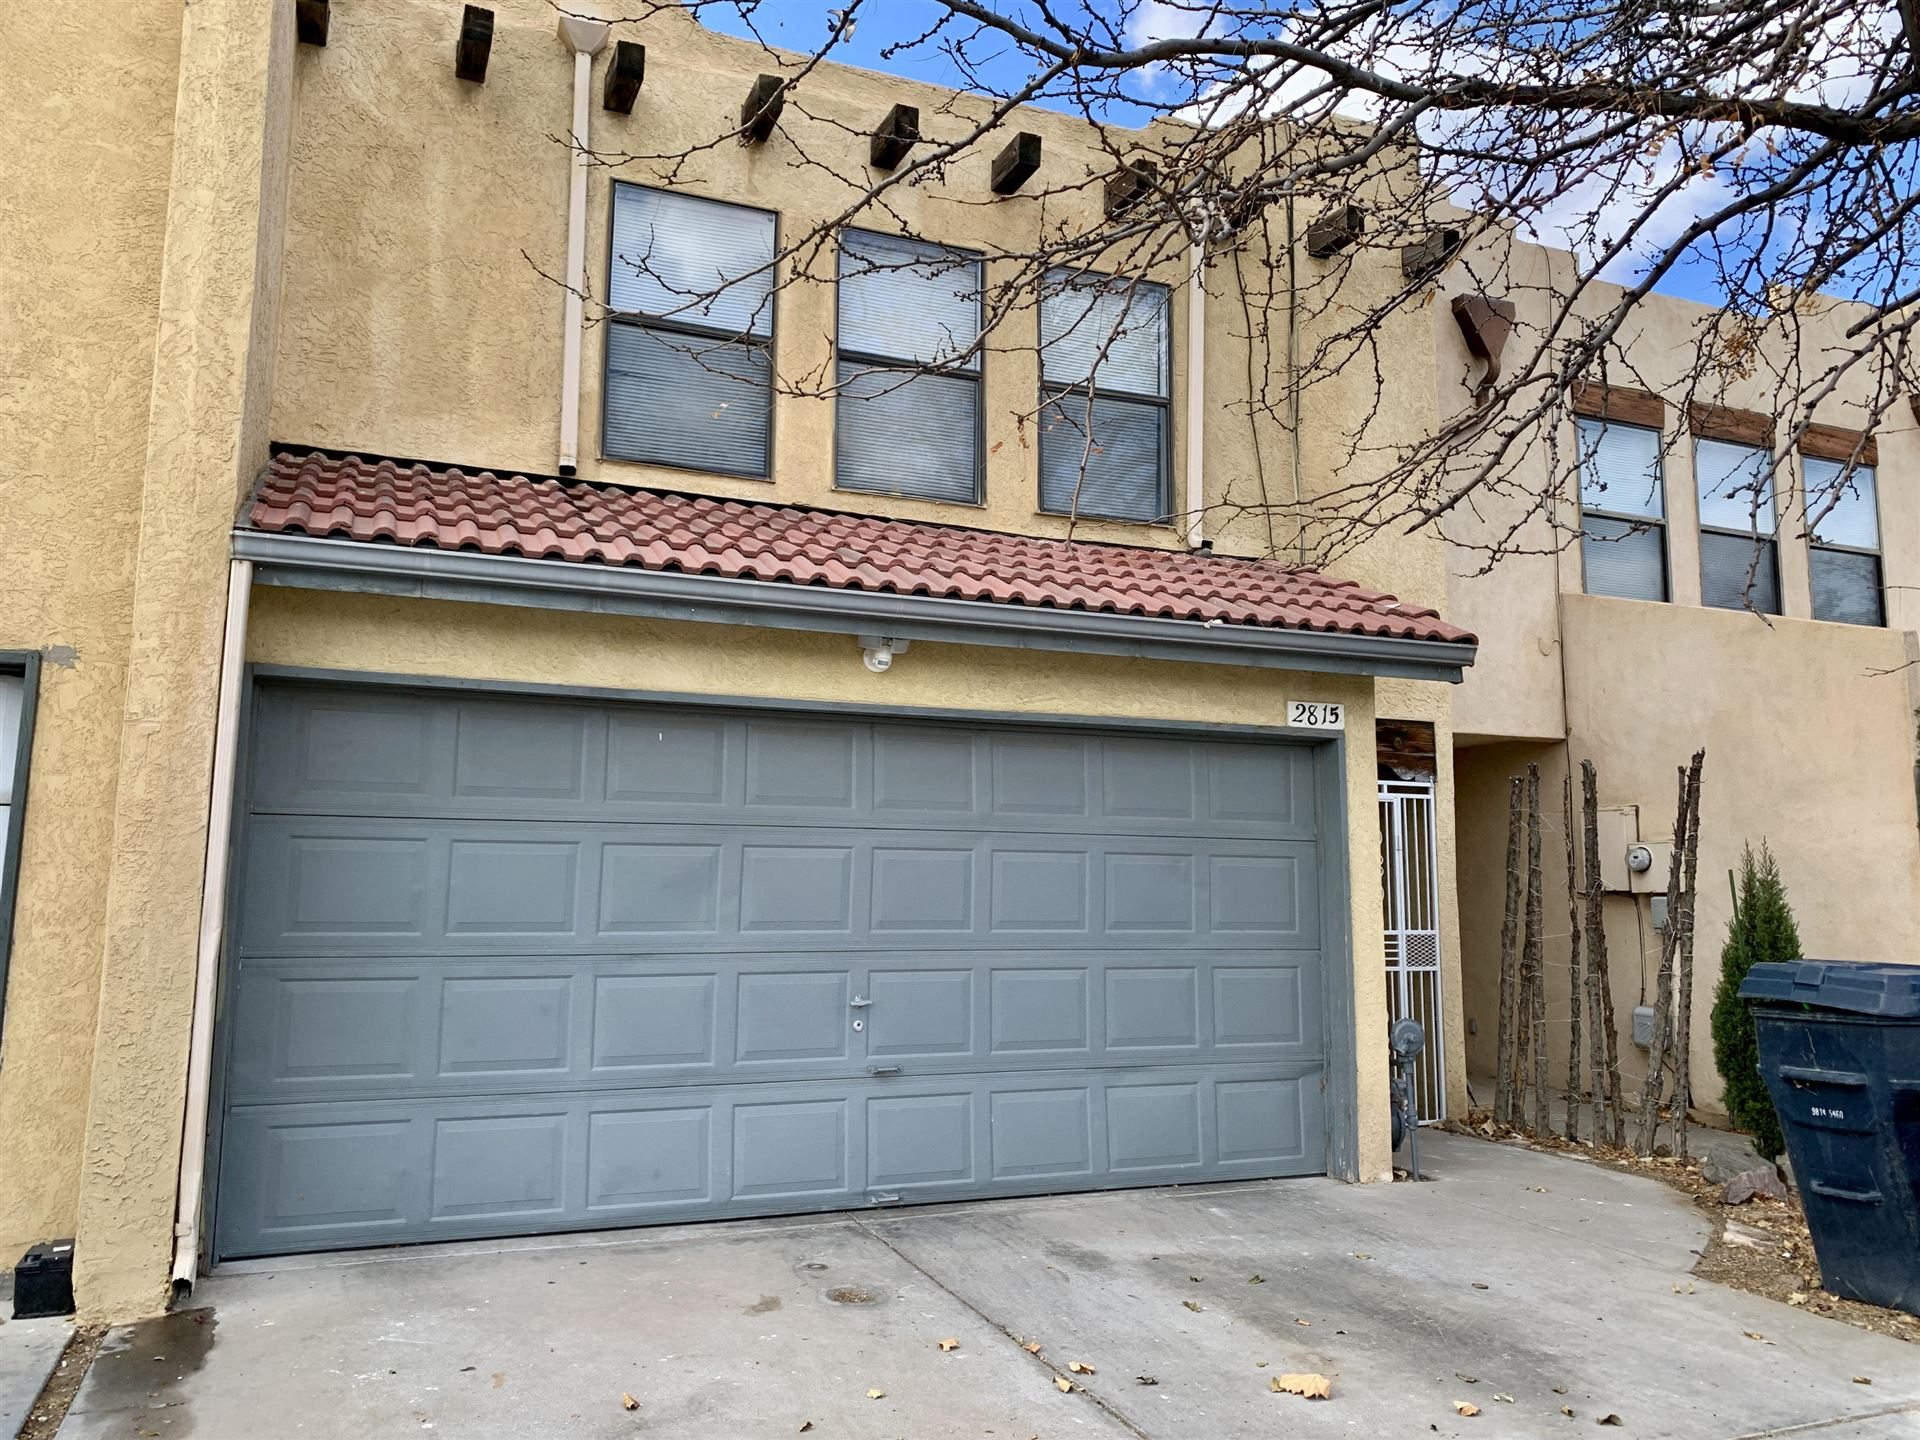 2815 ESTRELLA BRILLANTE Street NW, Albuquerque, NM 87120 - #: 981747